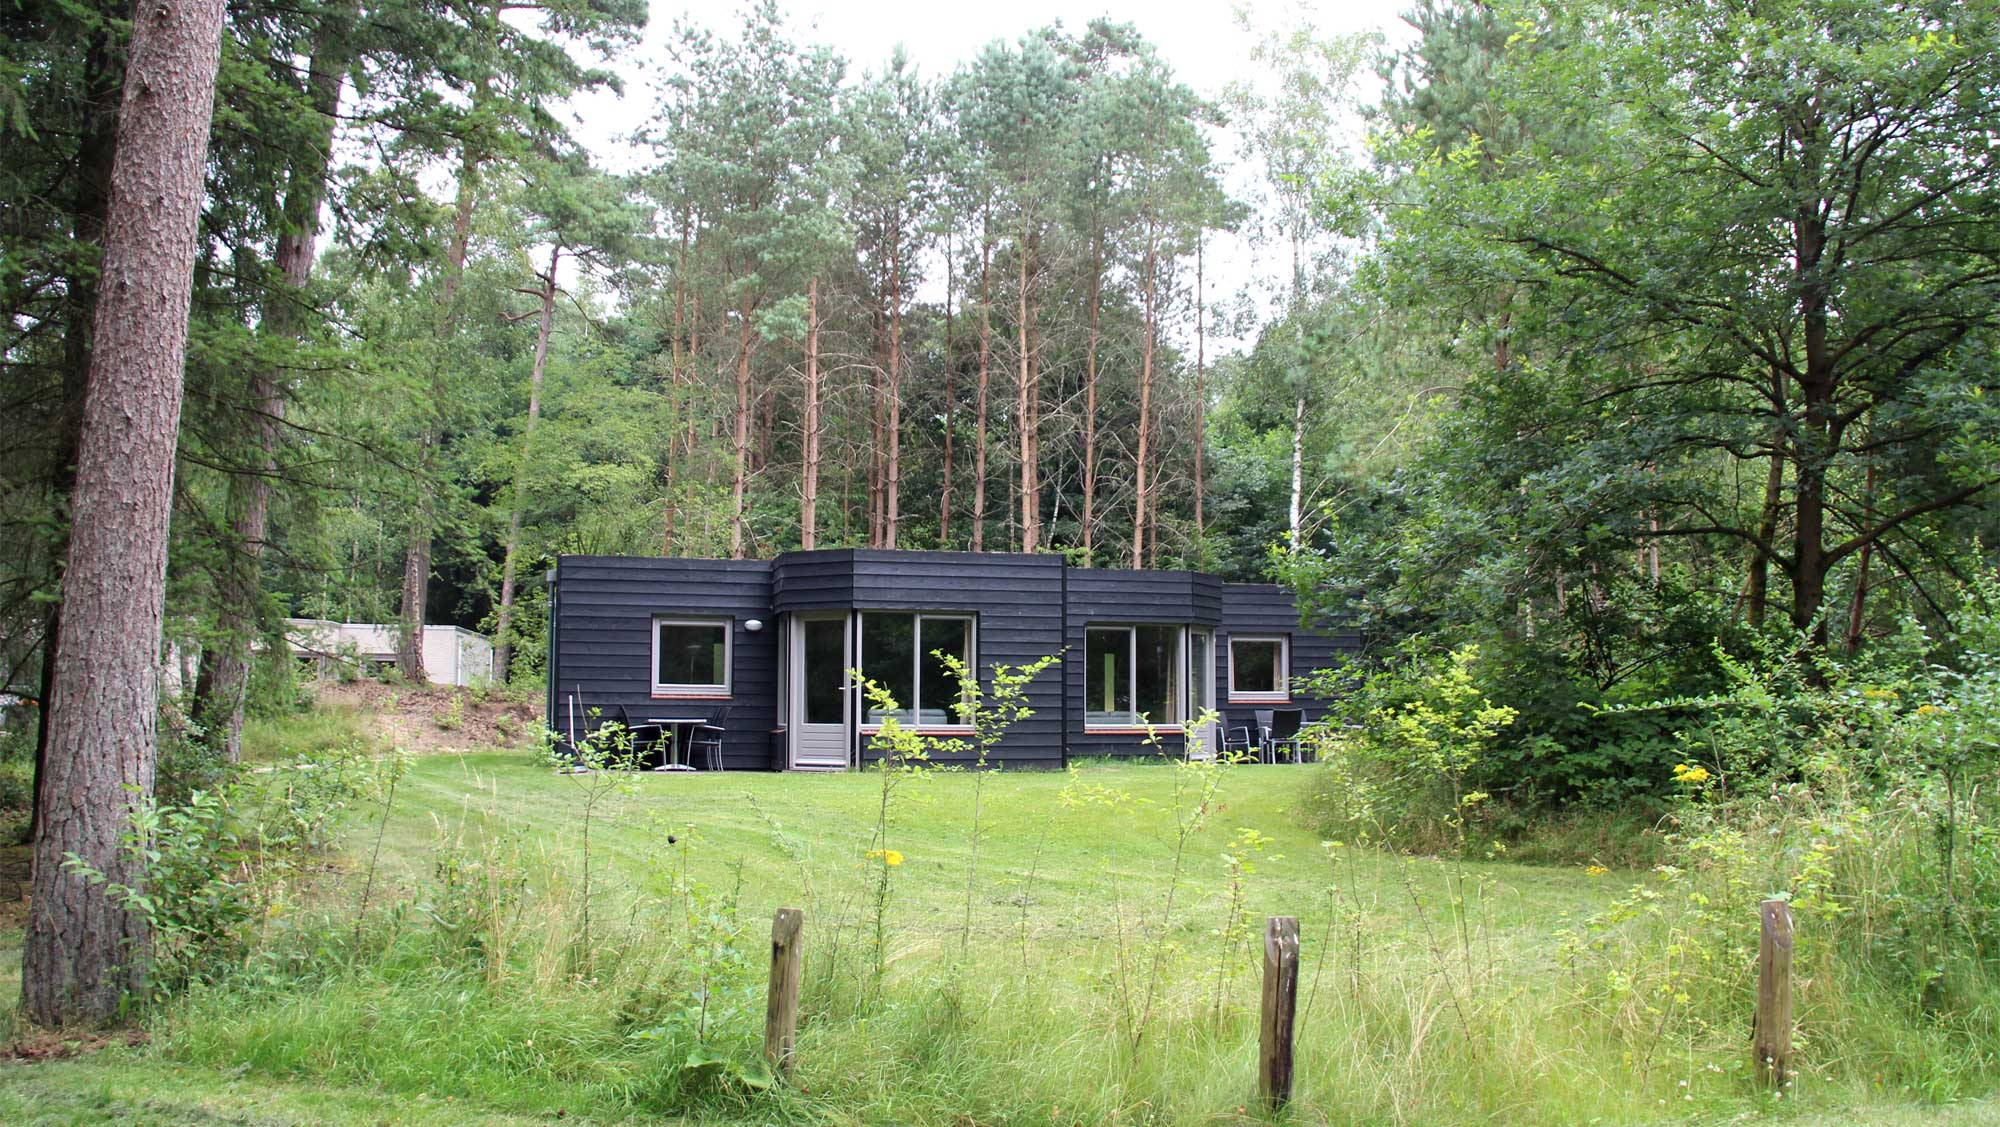 4pers bungalow Panorama Molecaten Park Landgoed Ginkelduin 01